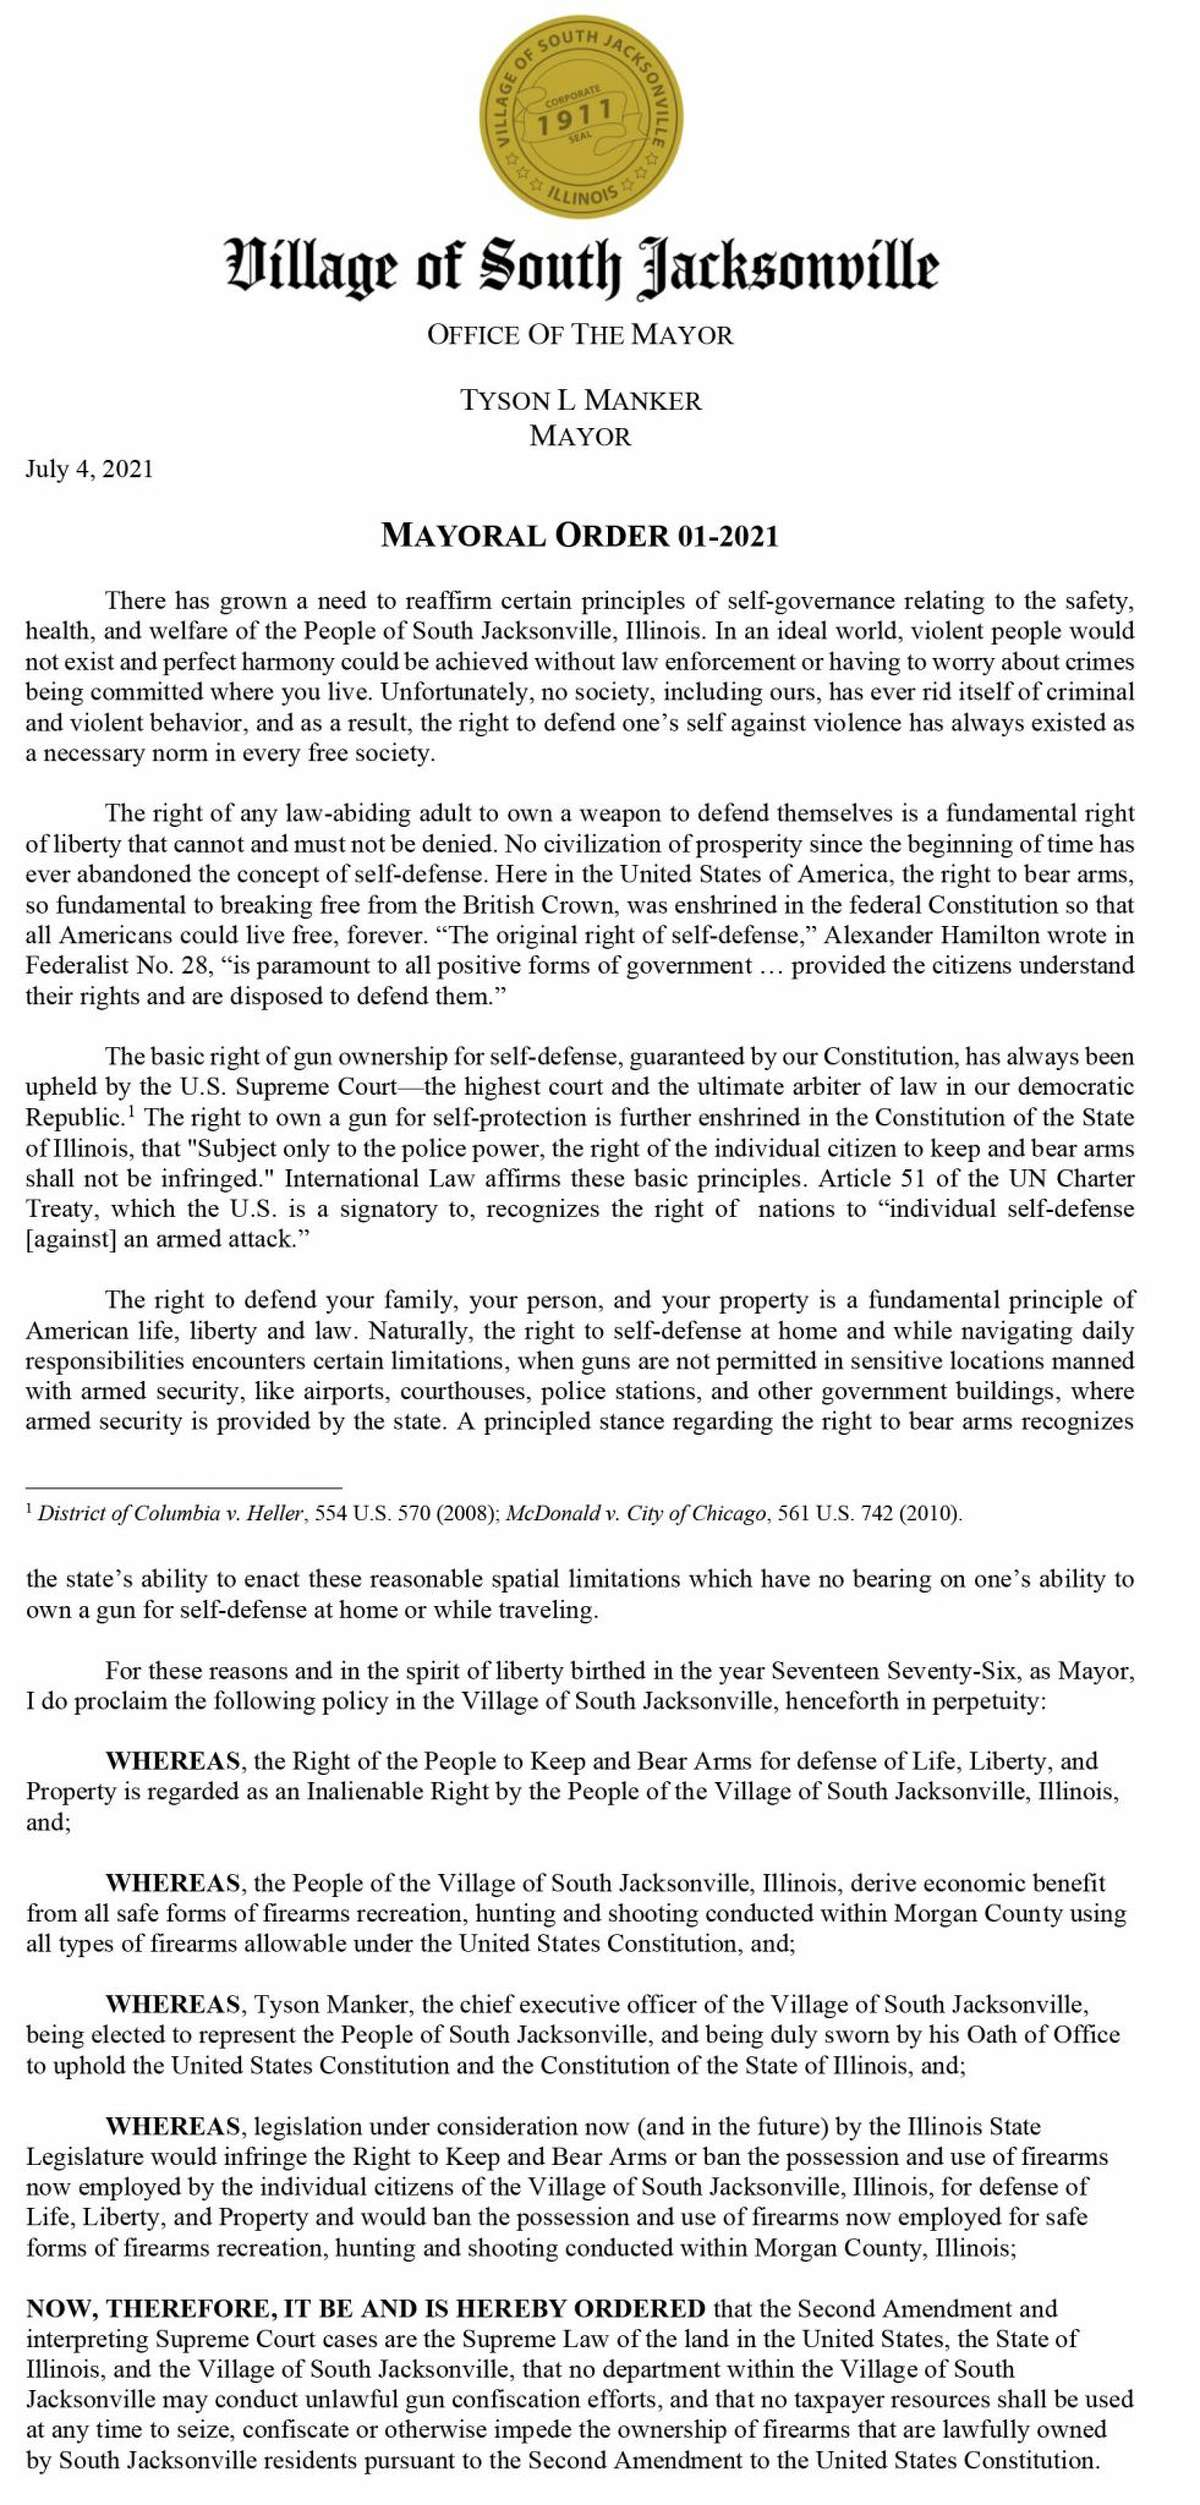 The text of an order establishing South Jacksonville as a Second Amendment Sanctuary.